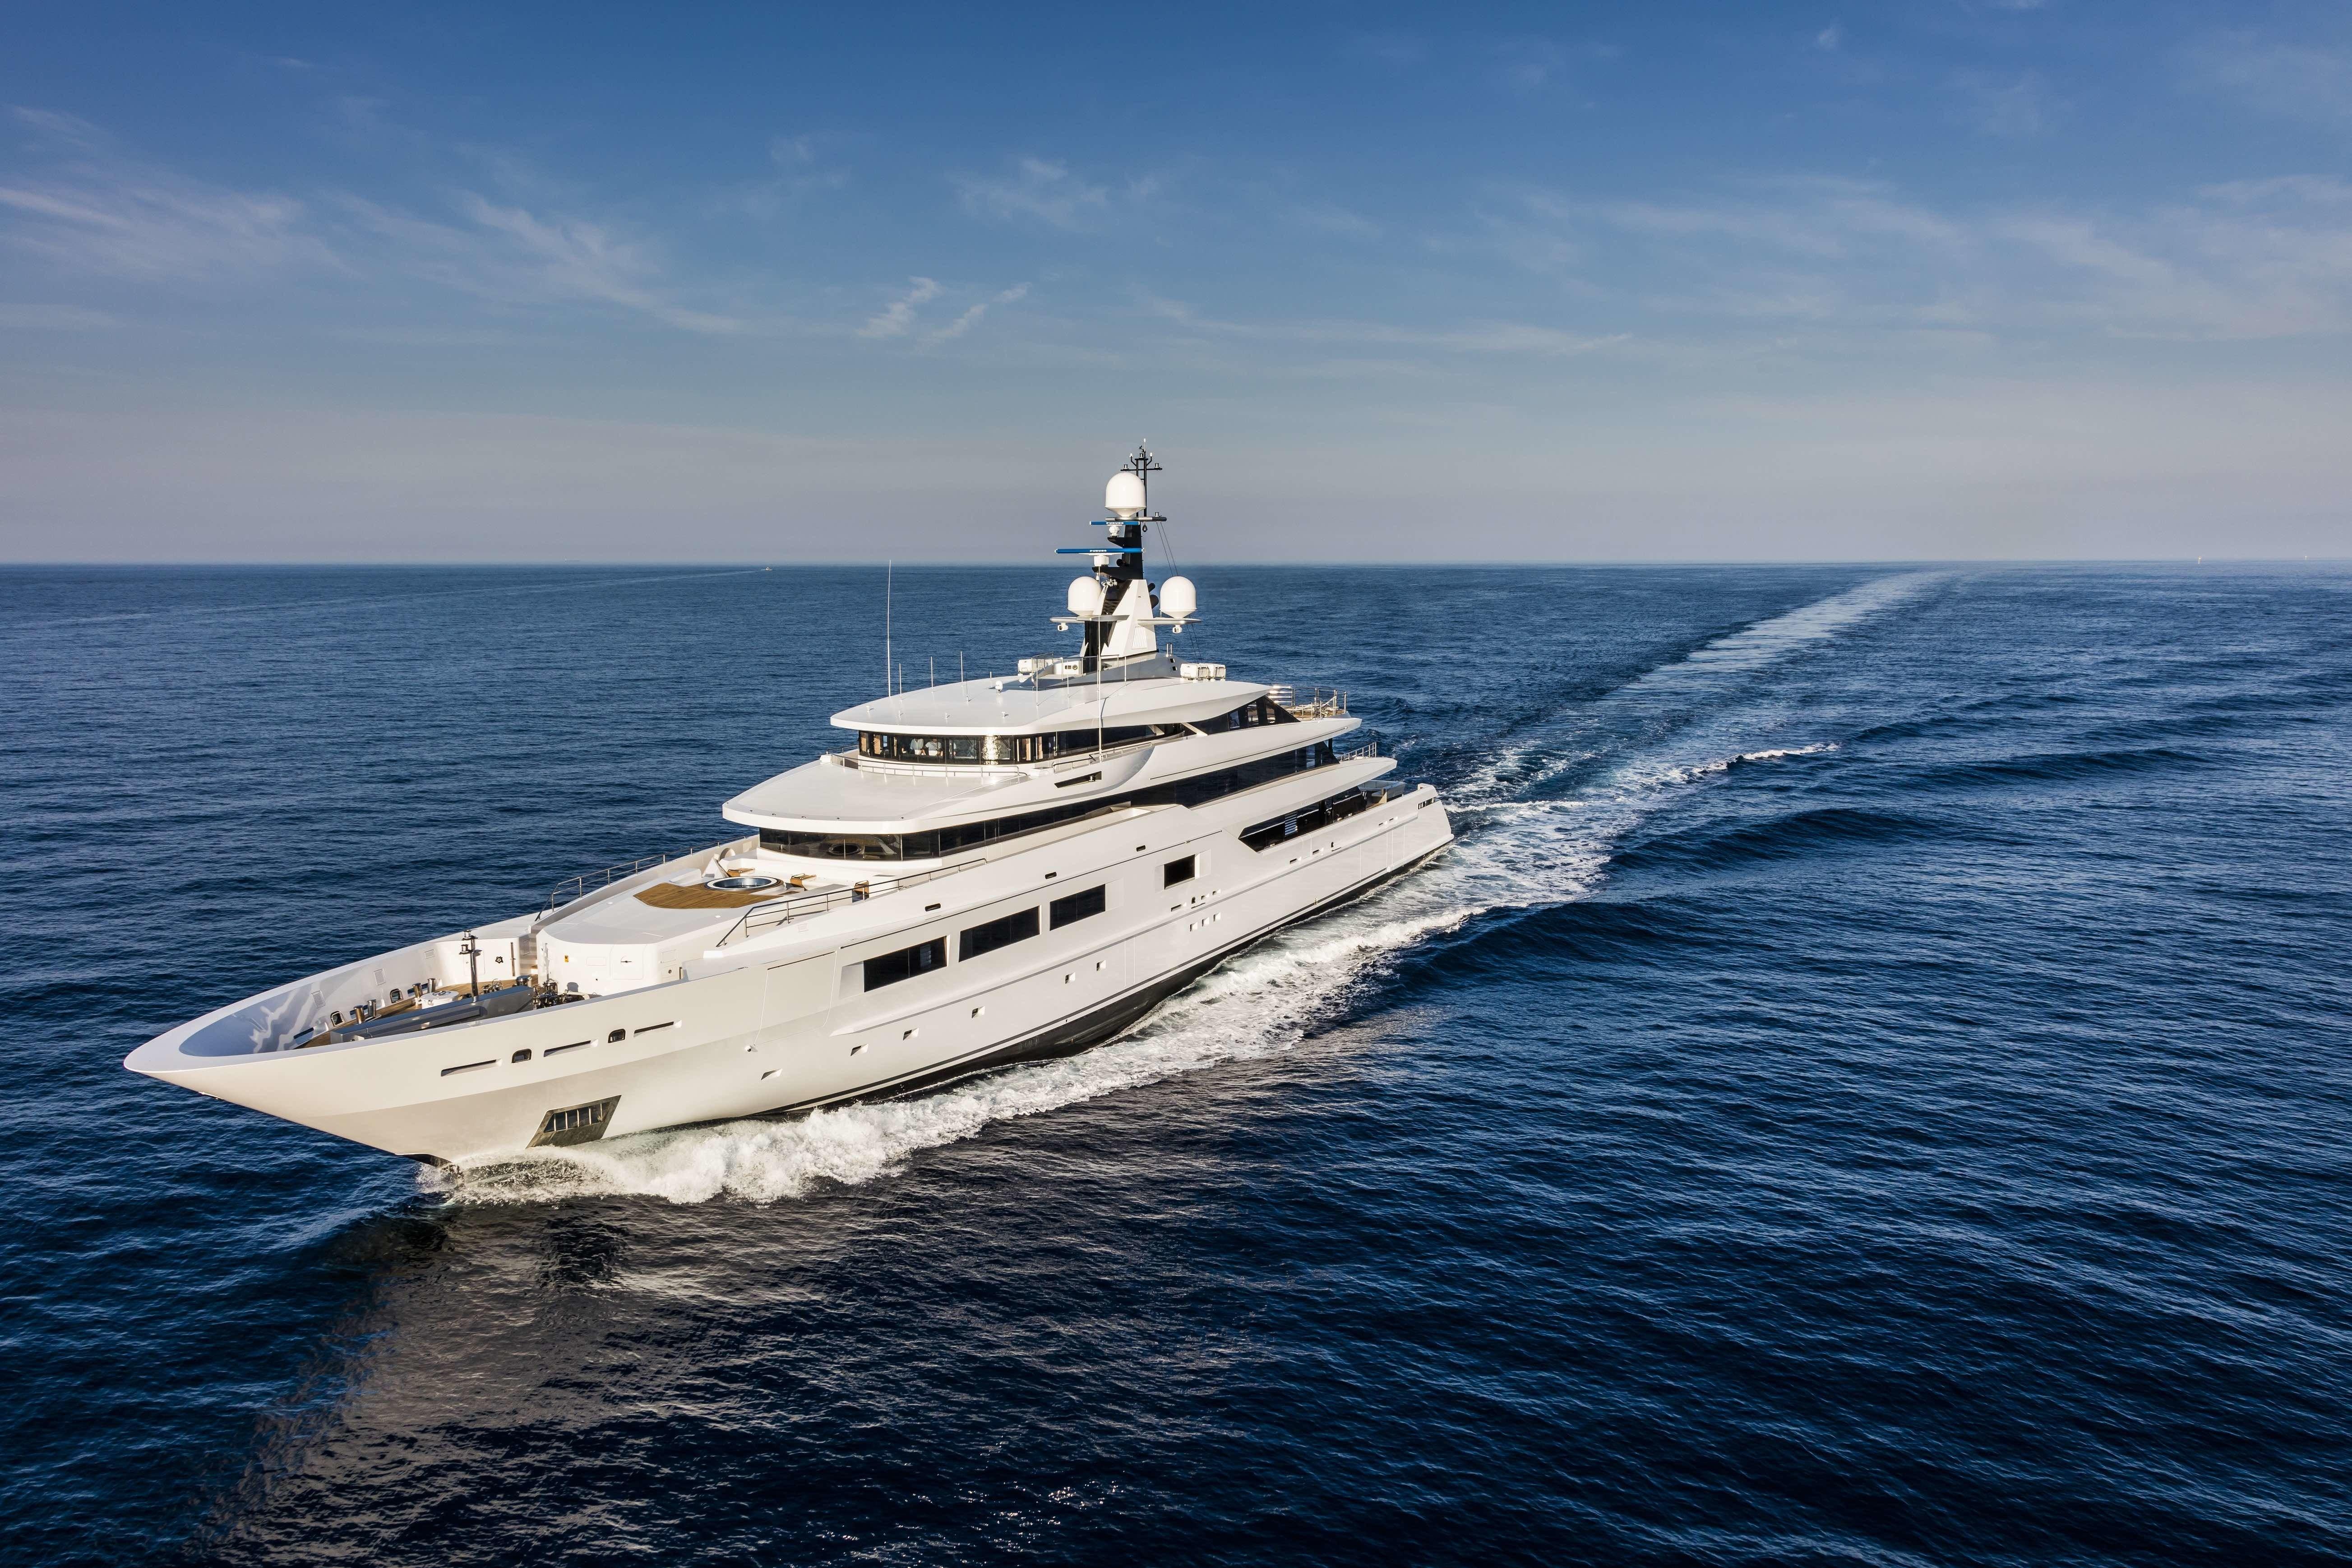 The 69m Yacht SUERTE